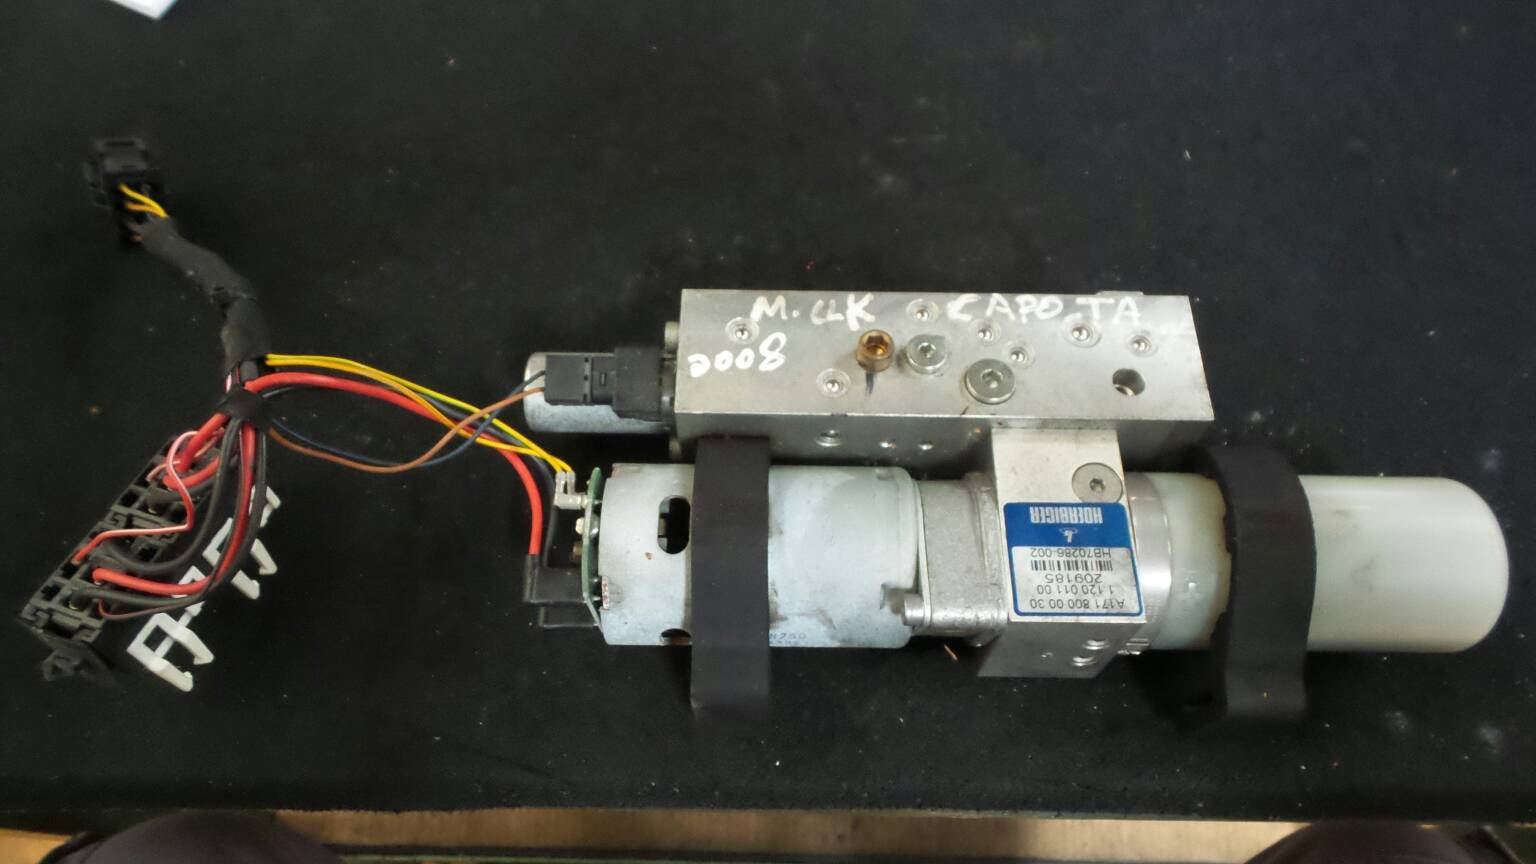 Tecto de Abrir Electrico MERCEDES-BENZ CLK Cabriolet (A209) | 02 - 10